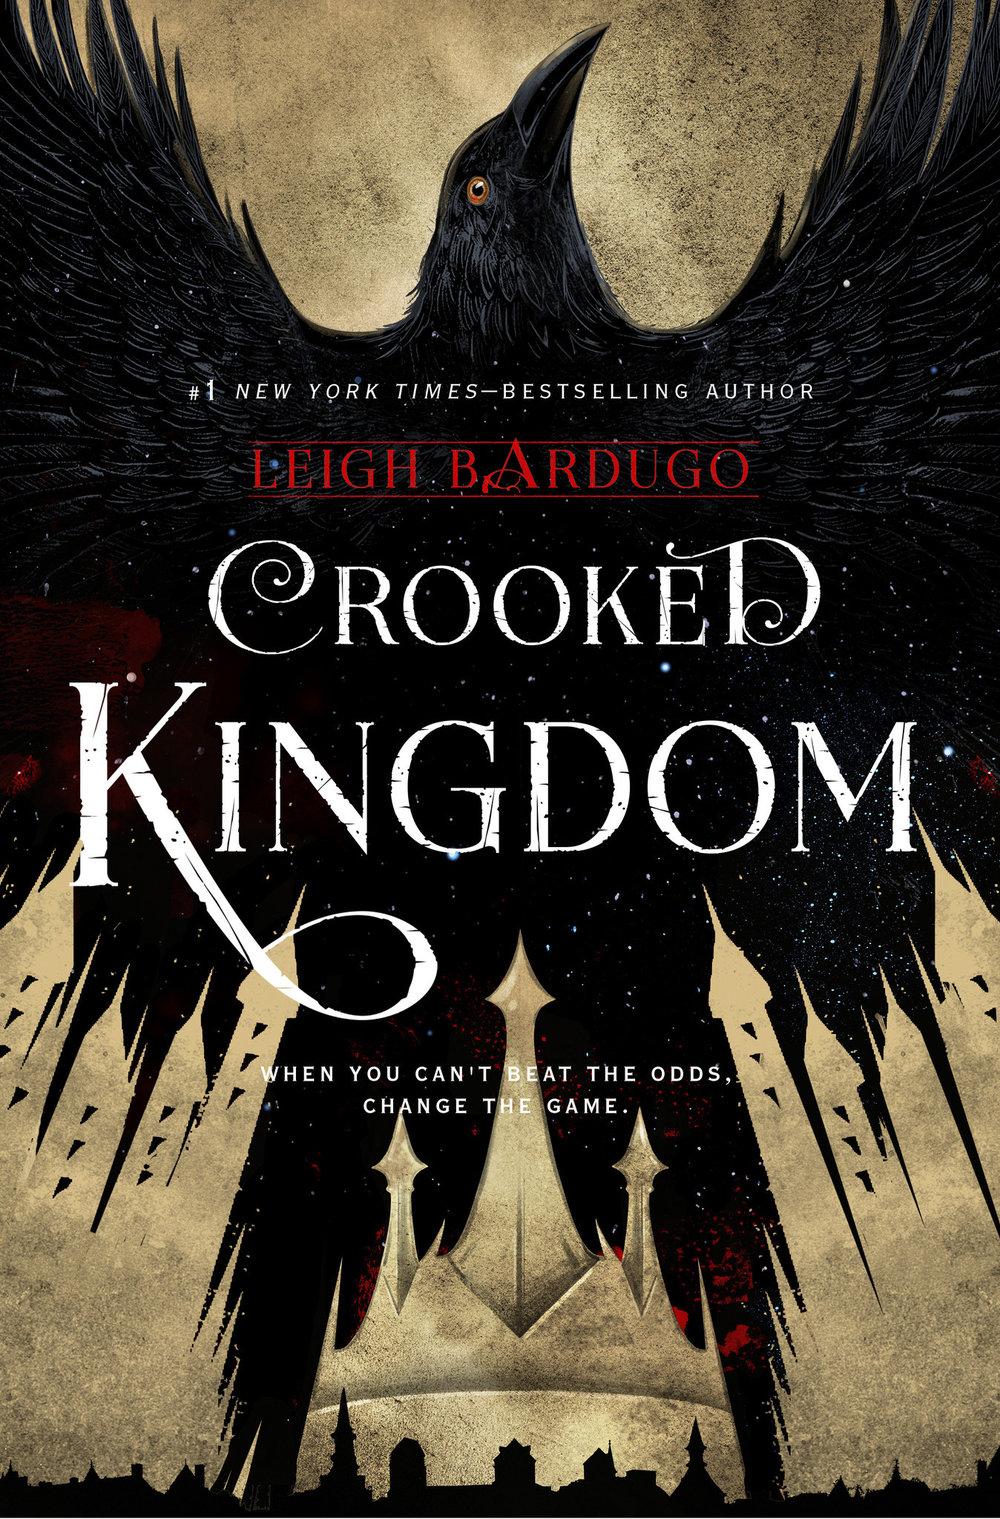 leigh-bardugo-crooked-kingdom.jpg